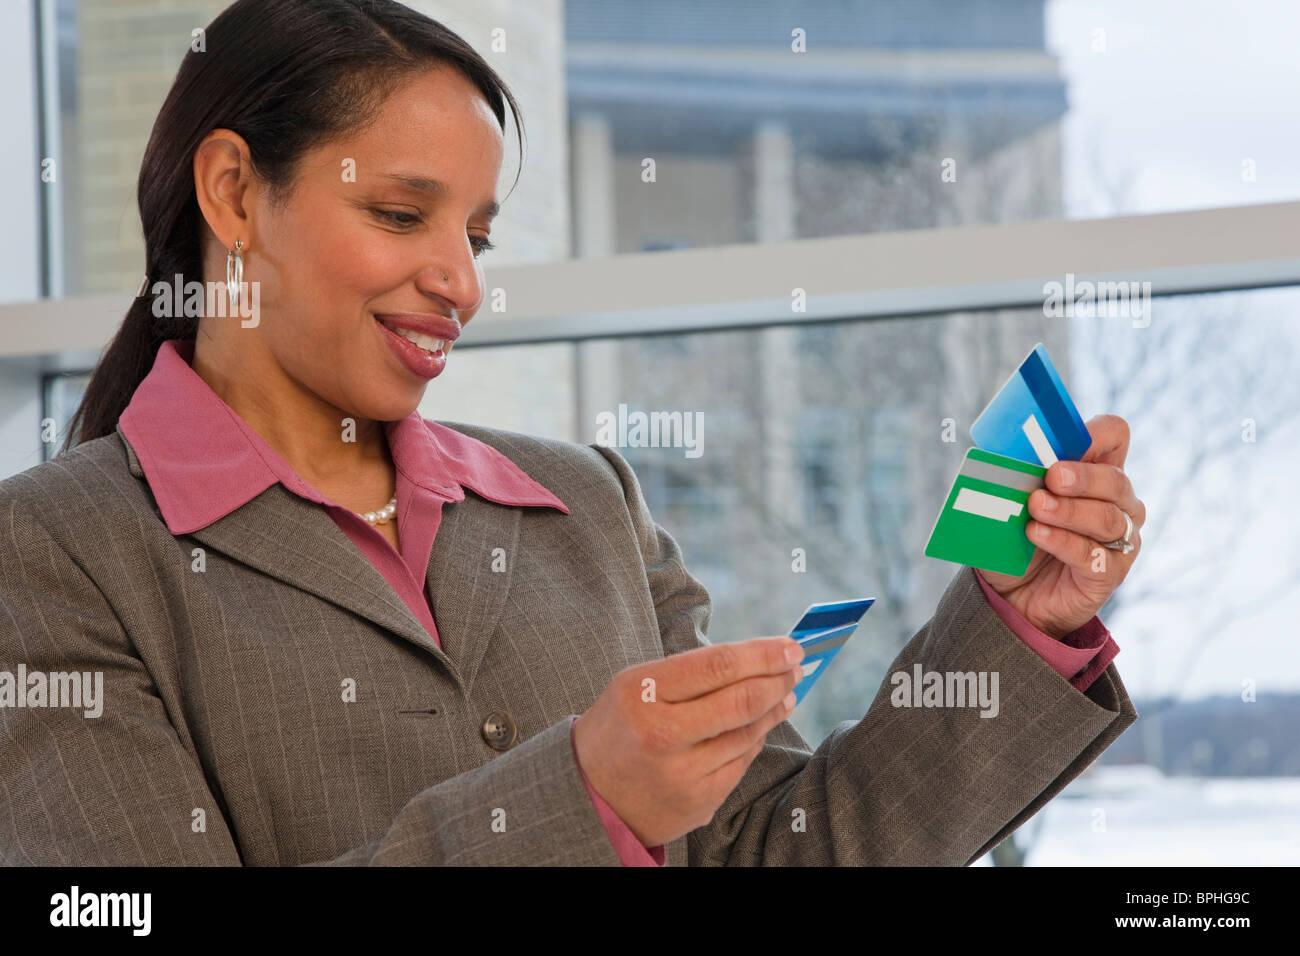 Hispanic businesswoman holding credit cards - Stock Image